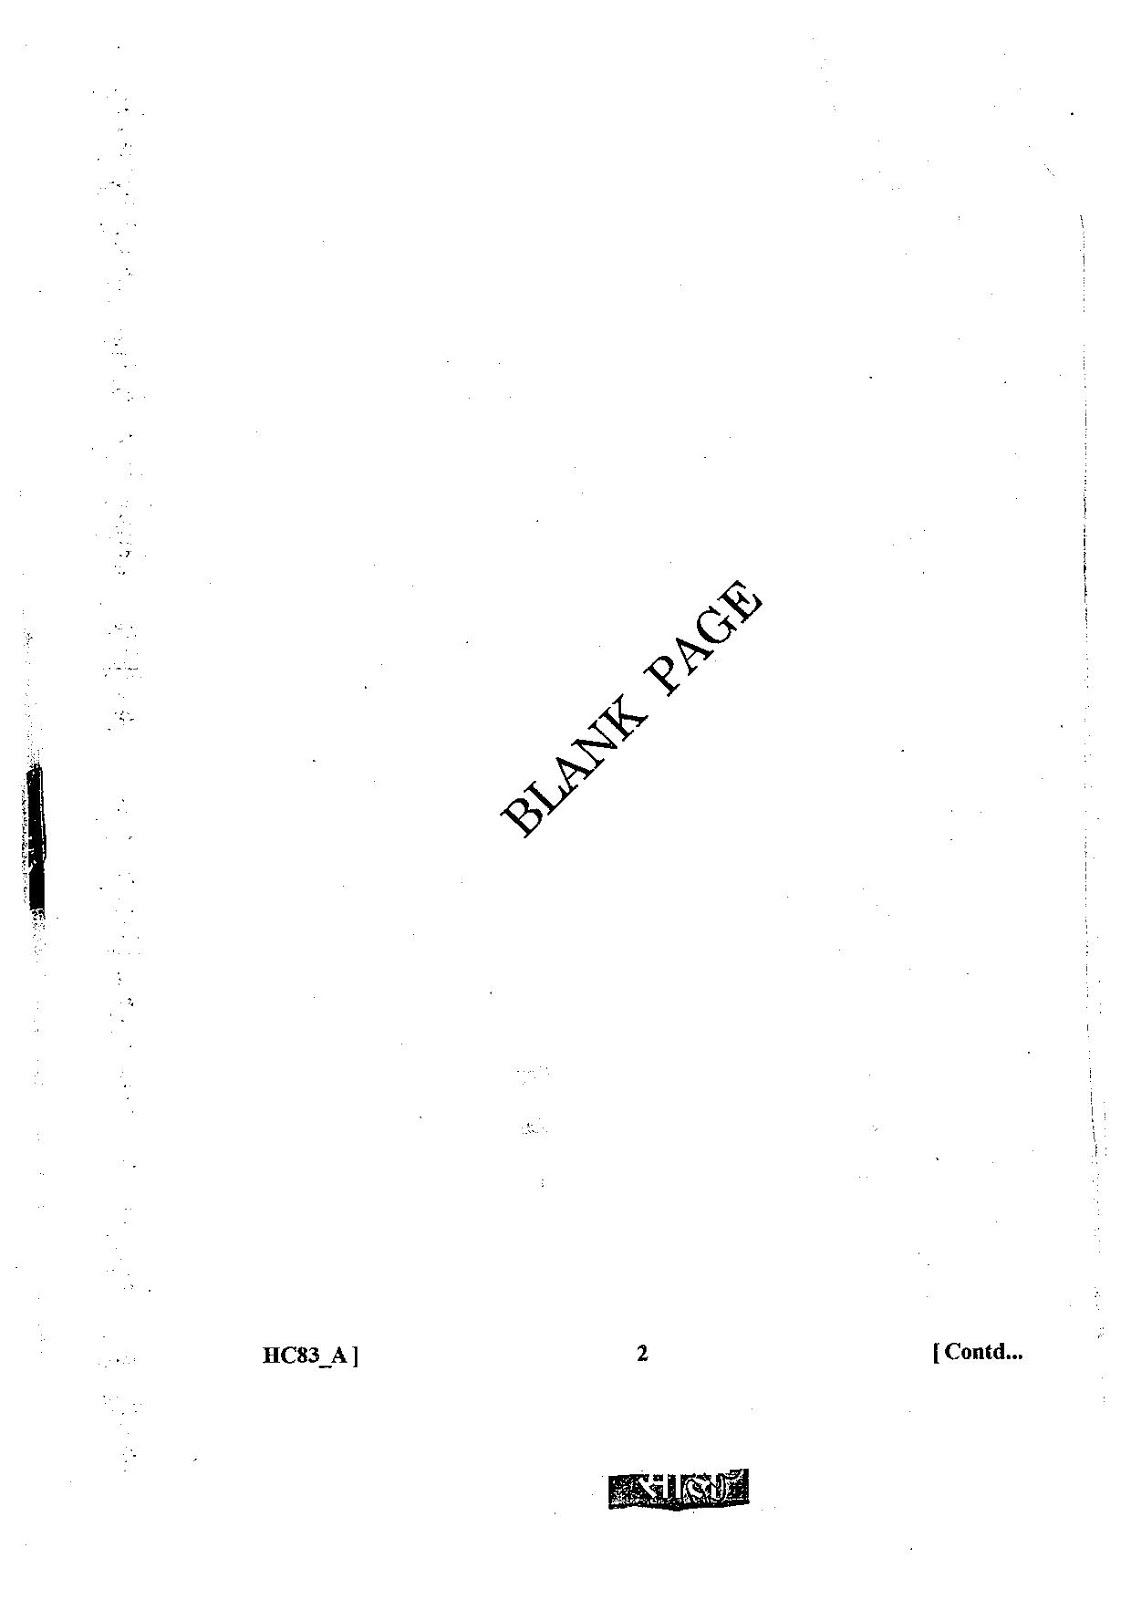 Bser Reet 2015-16 Sample & Model Paper Pdf